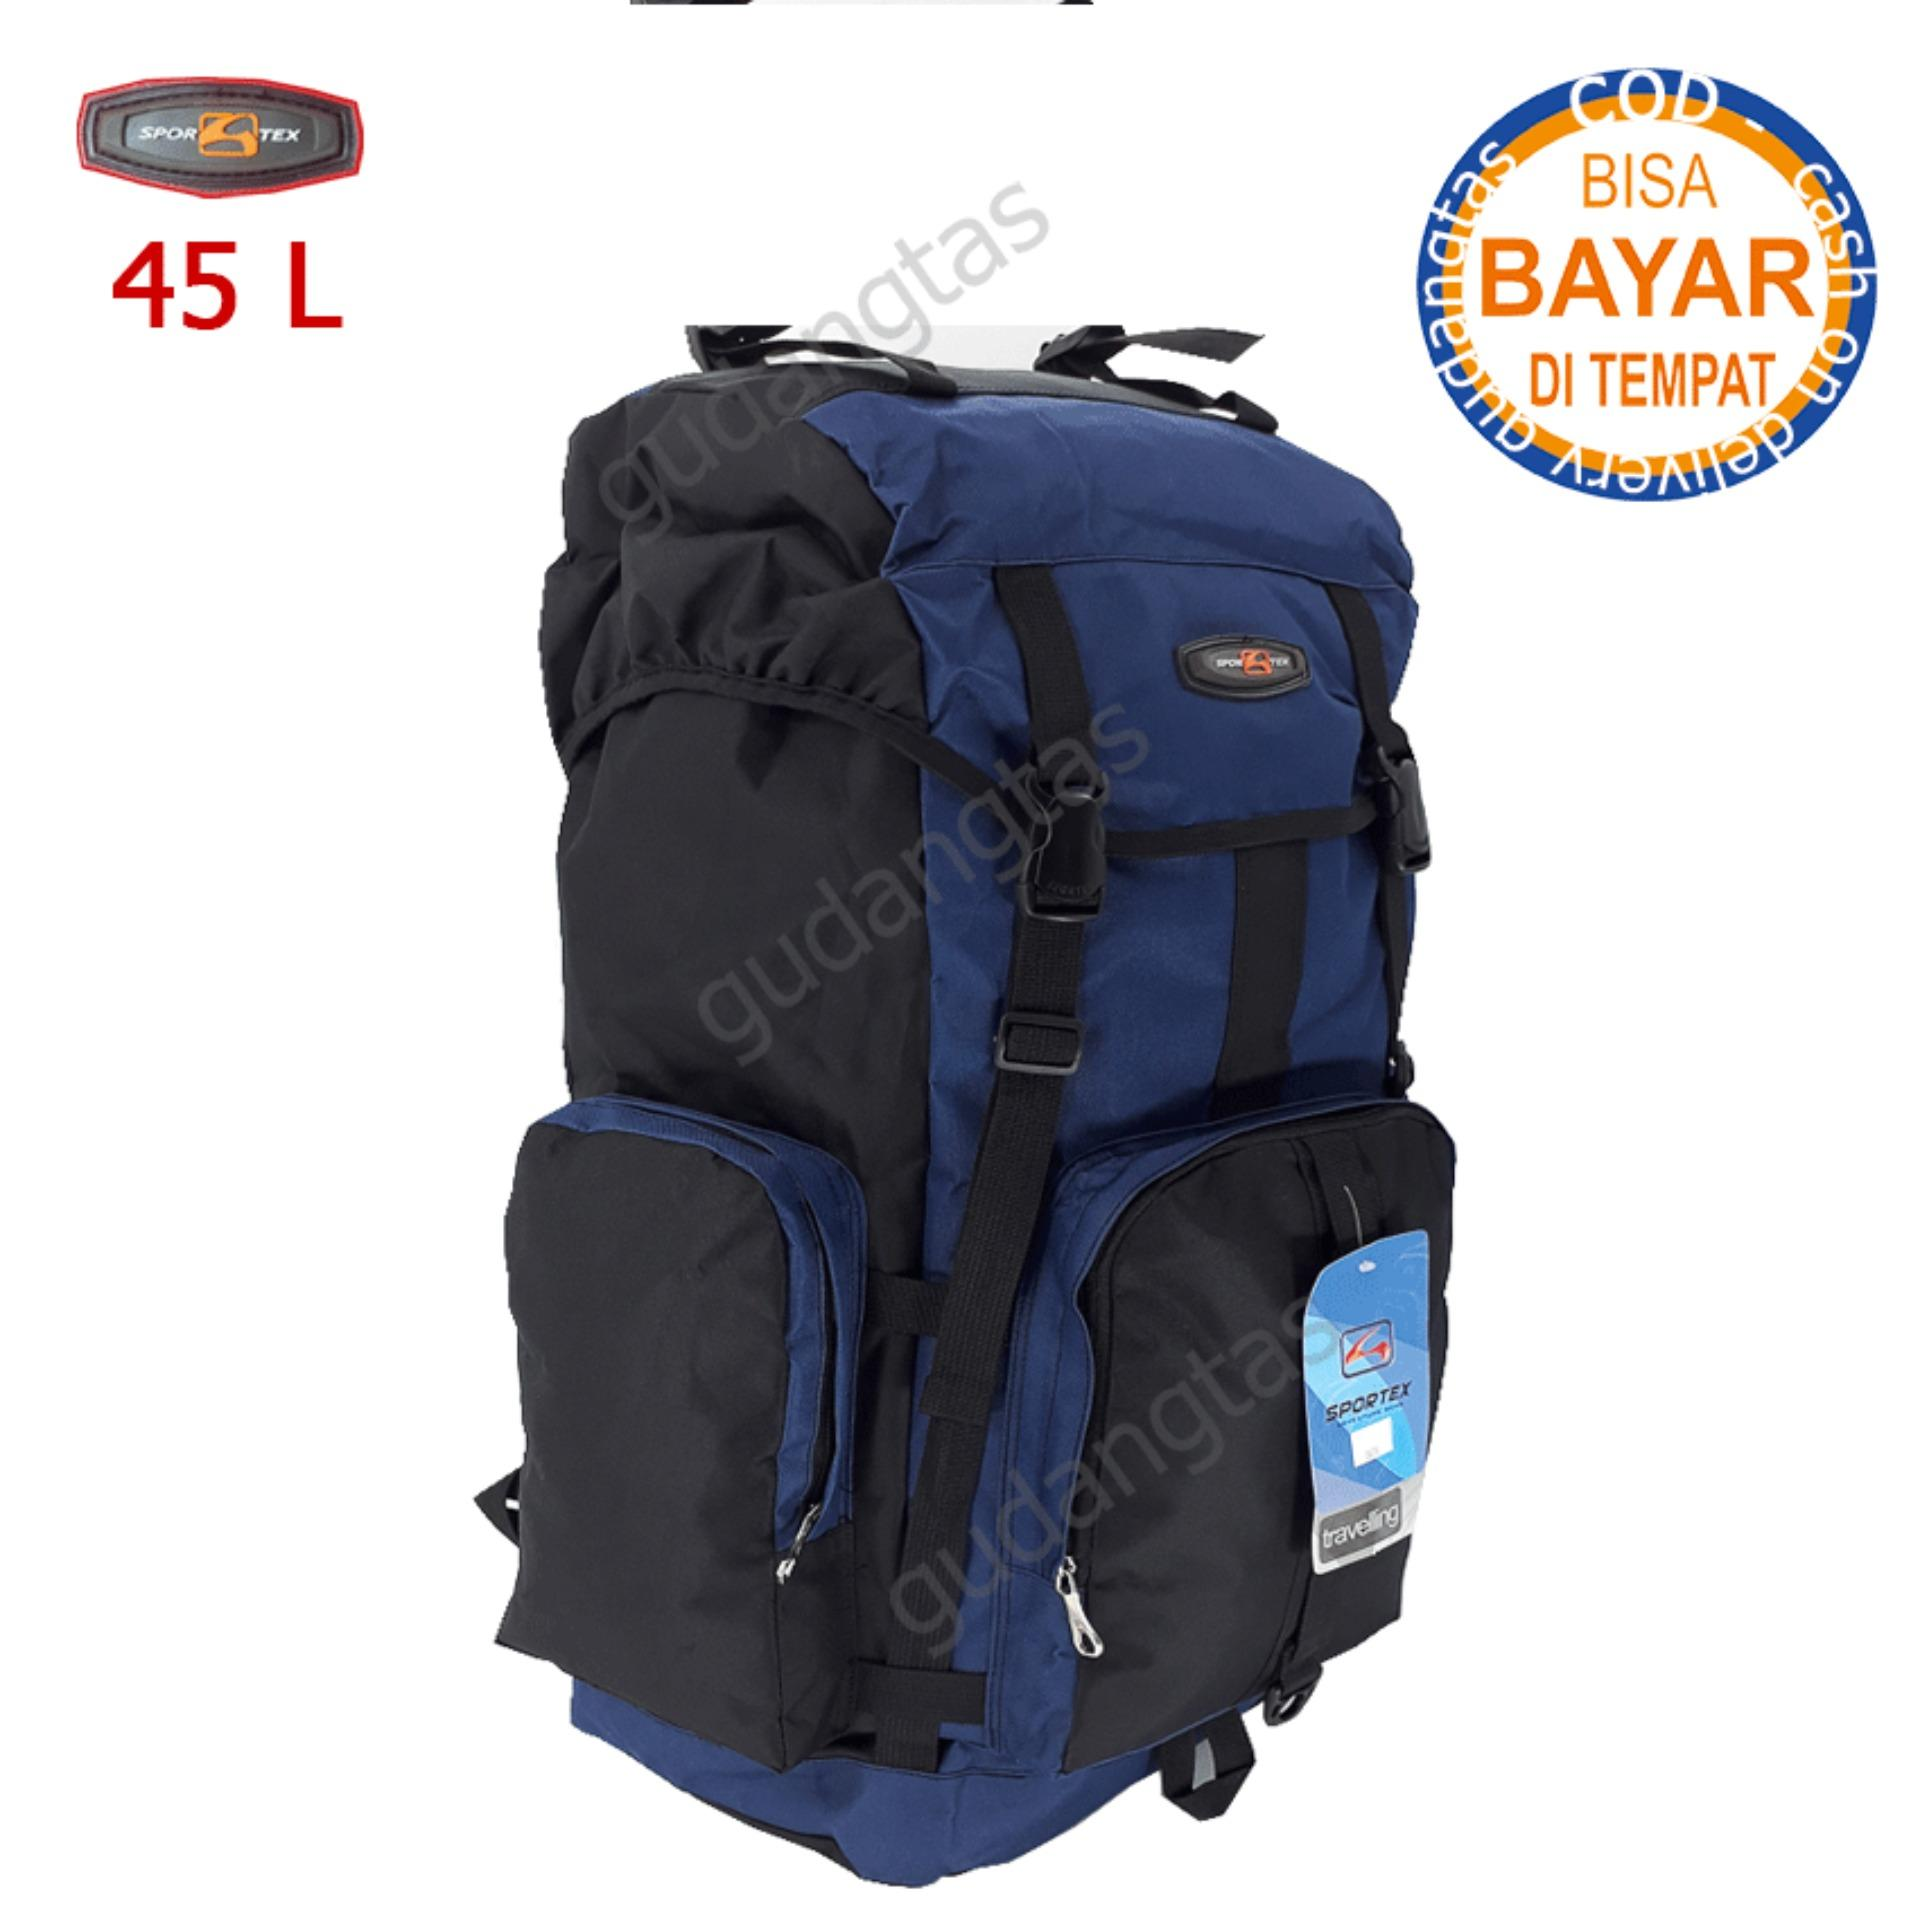 Jual Tas Ransel Hiking Terbaik Tenda Kap 4 5 6 Sportex Gunung Keril Carrier Camping 45l 04yy40l Dongker Kombinasi Hitam